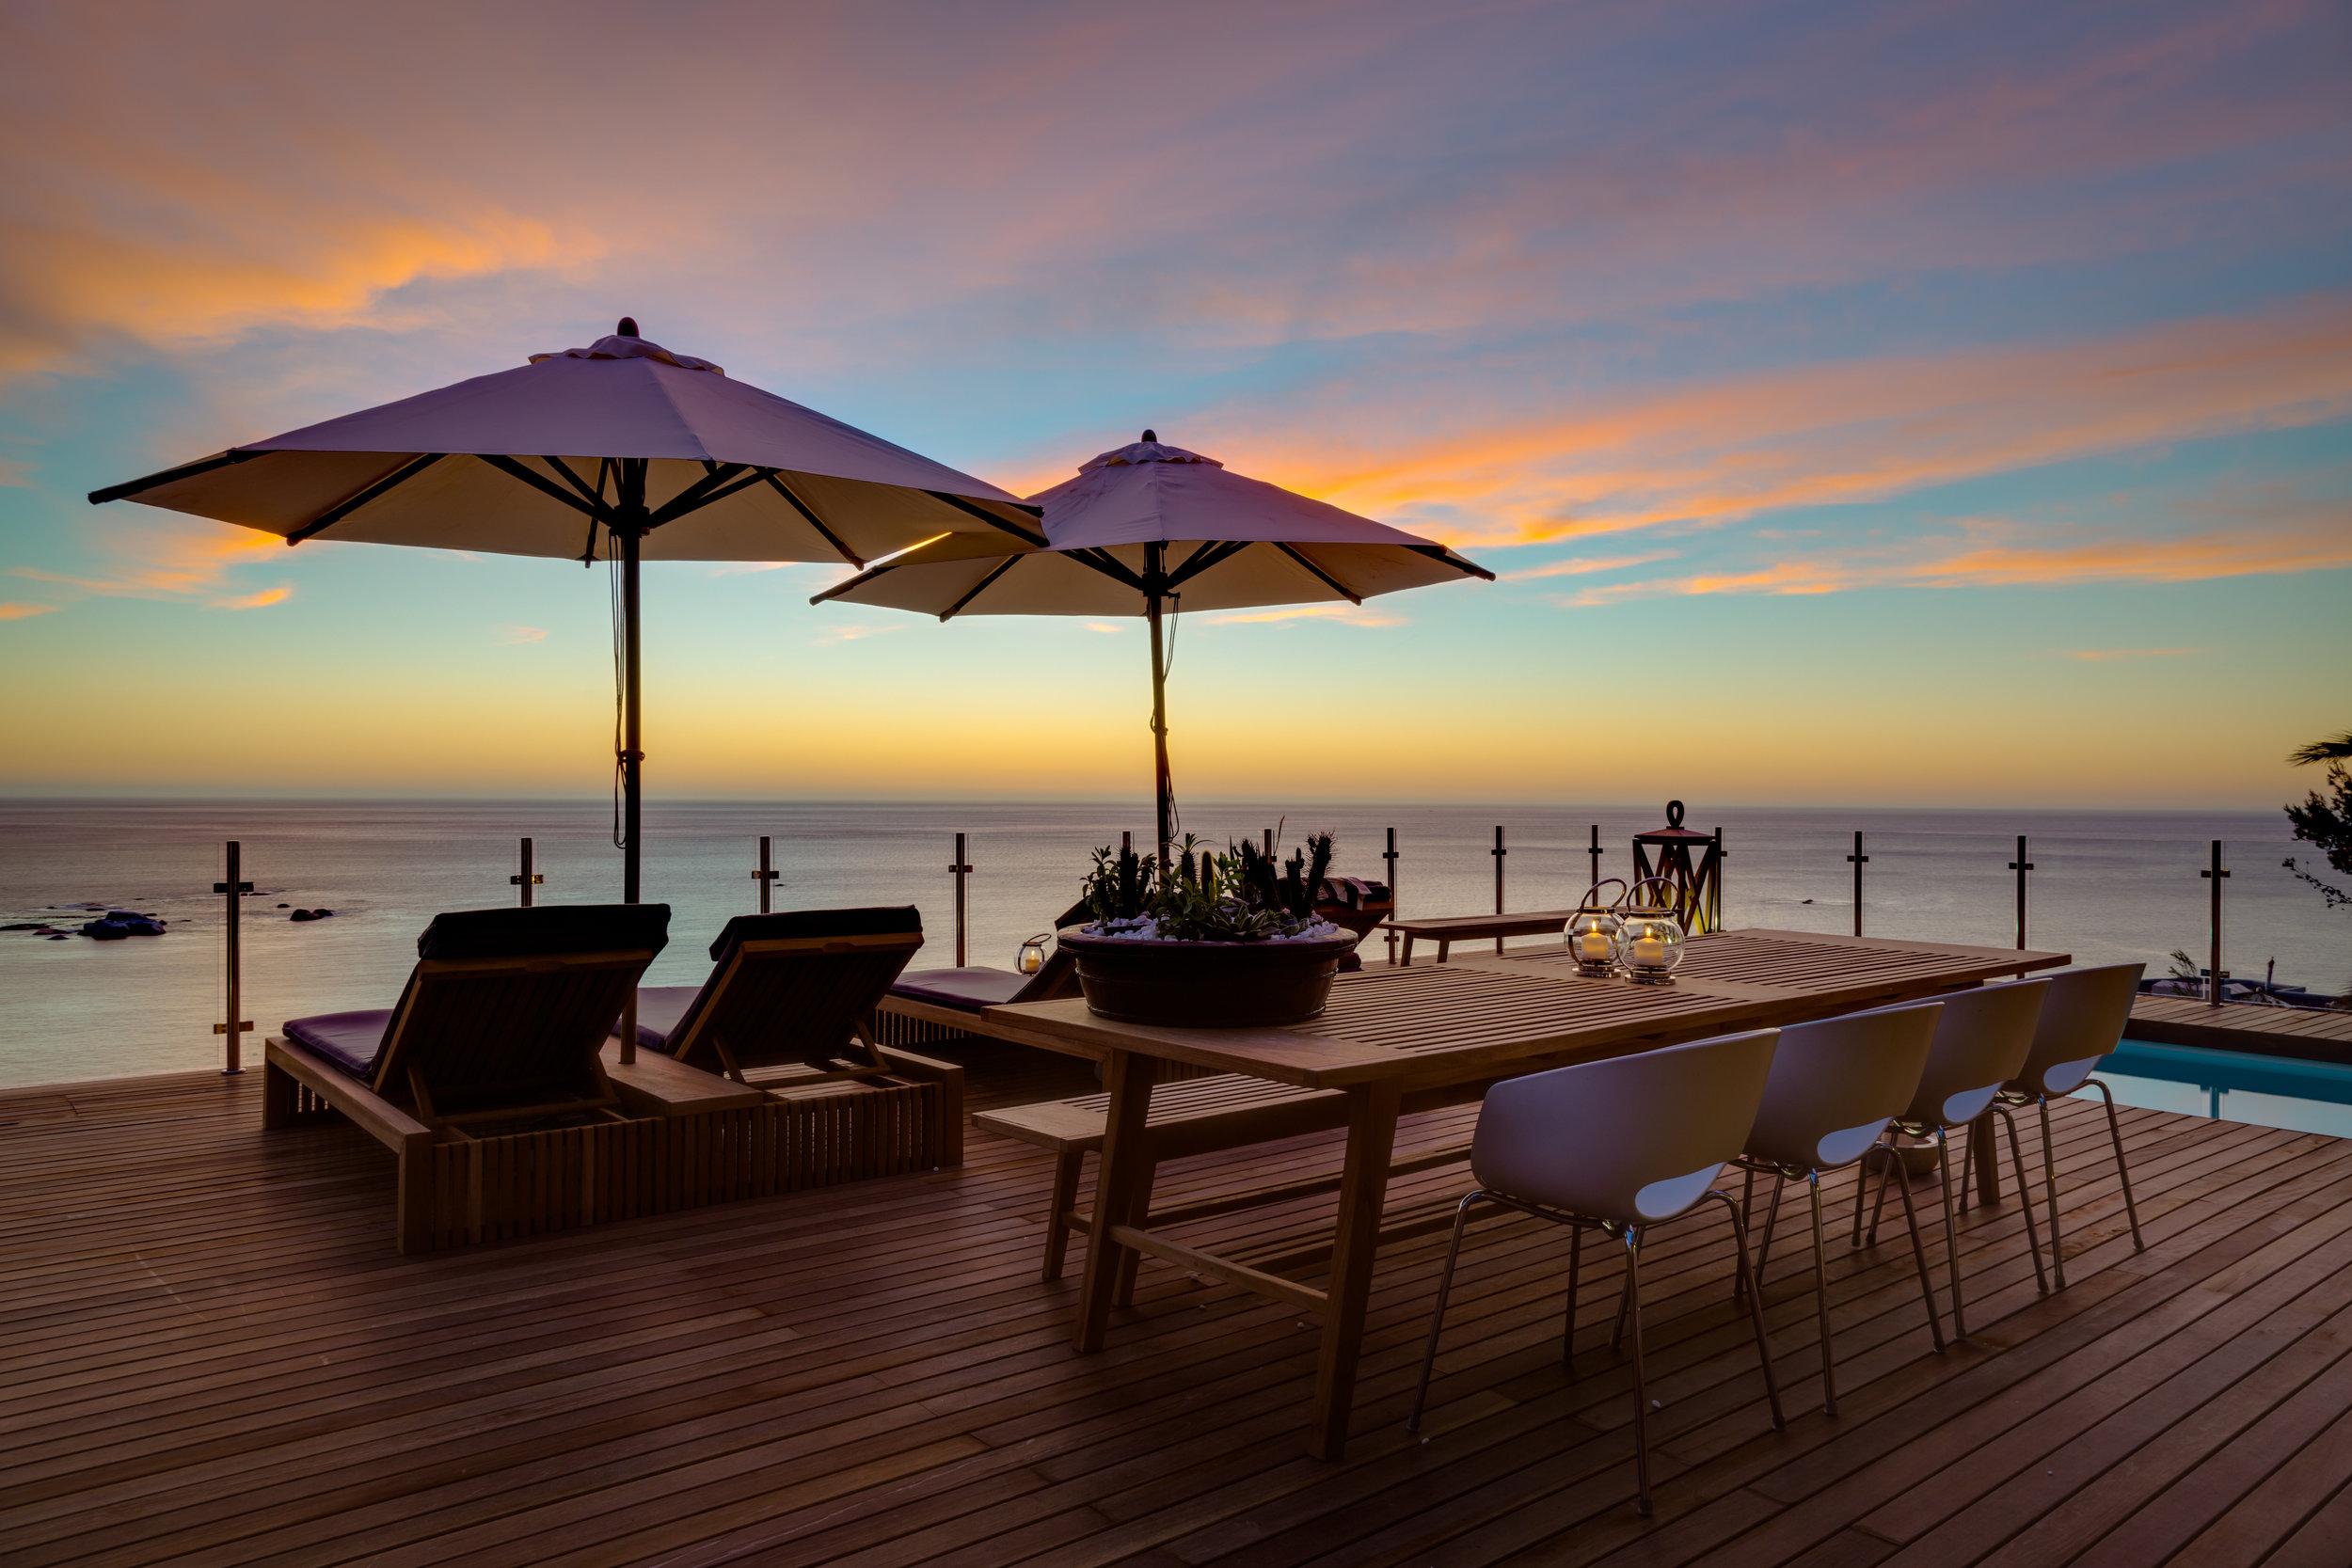 sunset on pool deck 3.jpg